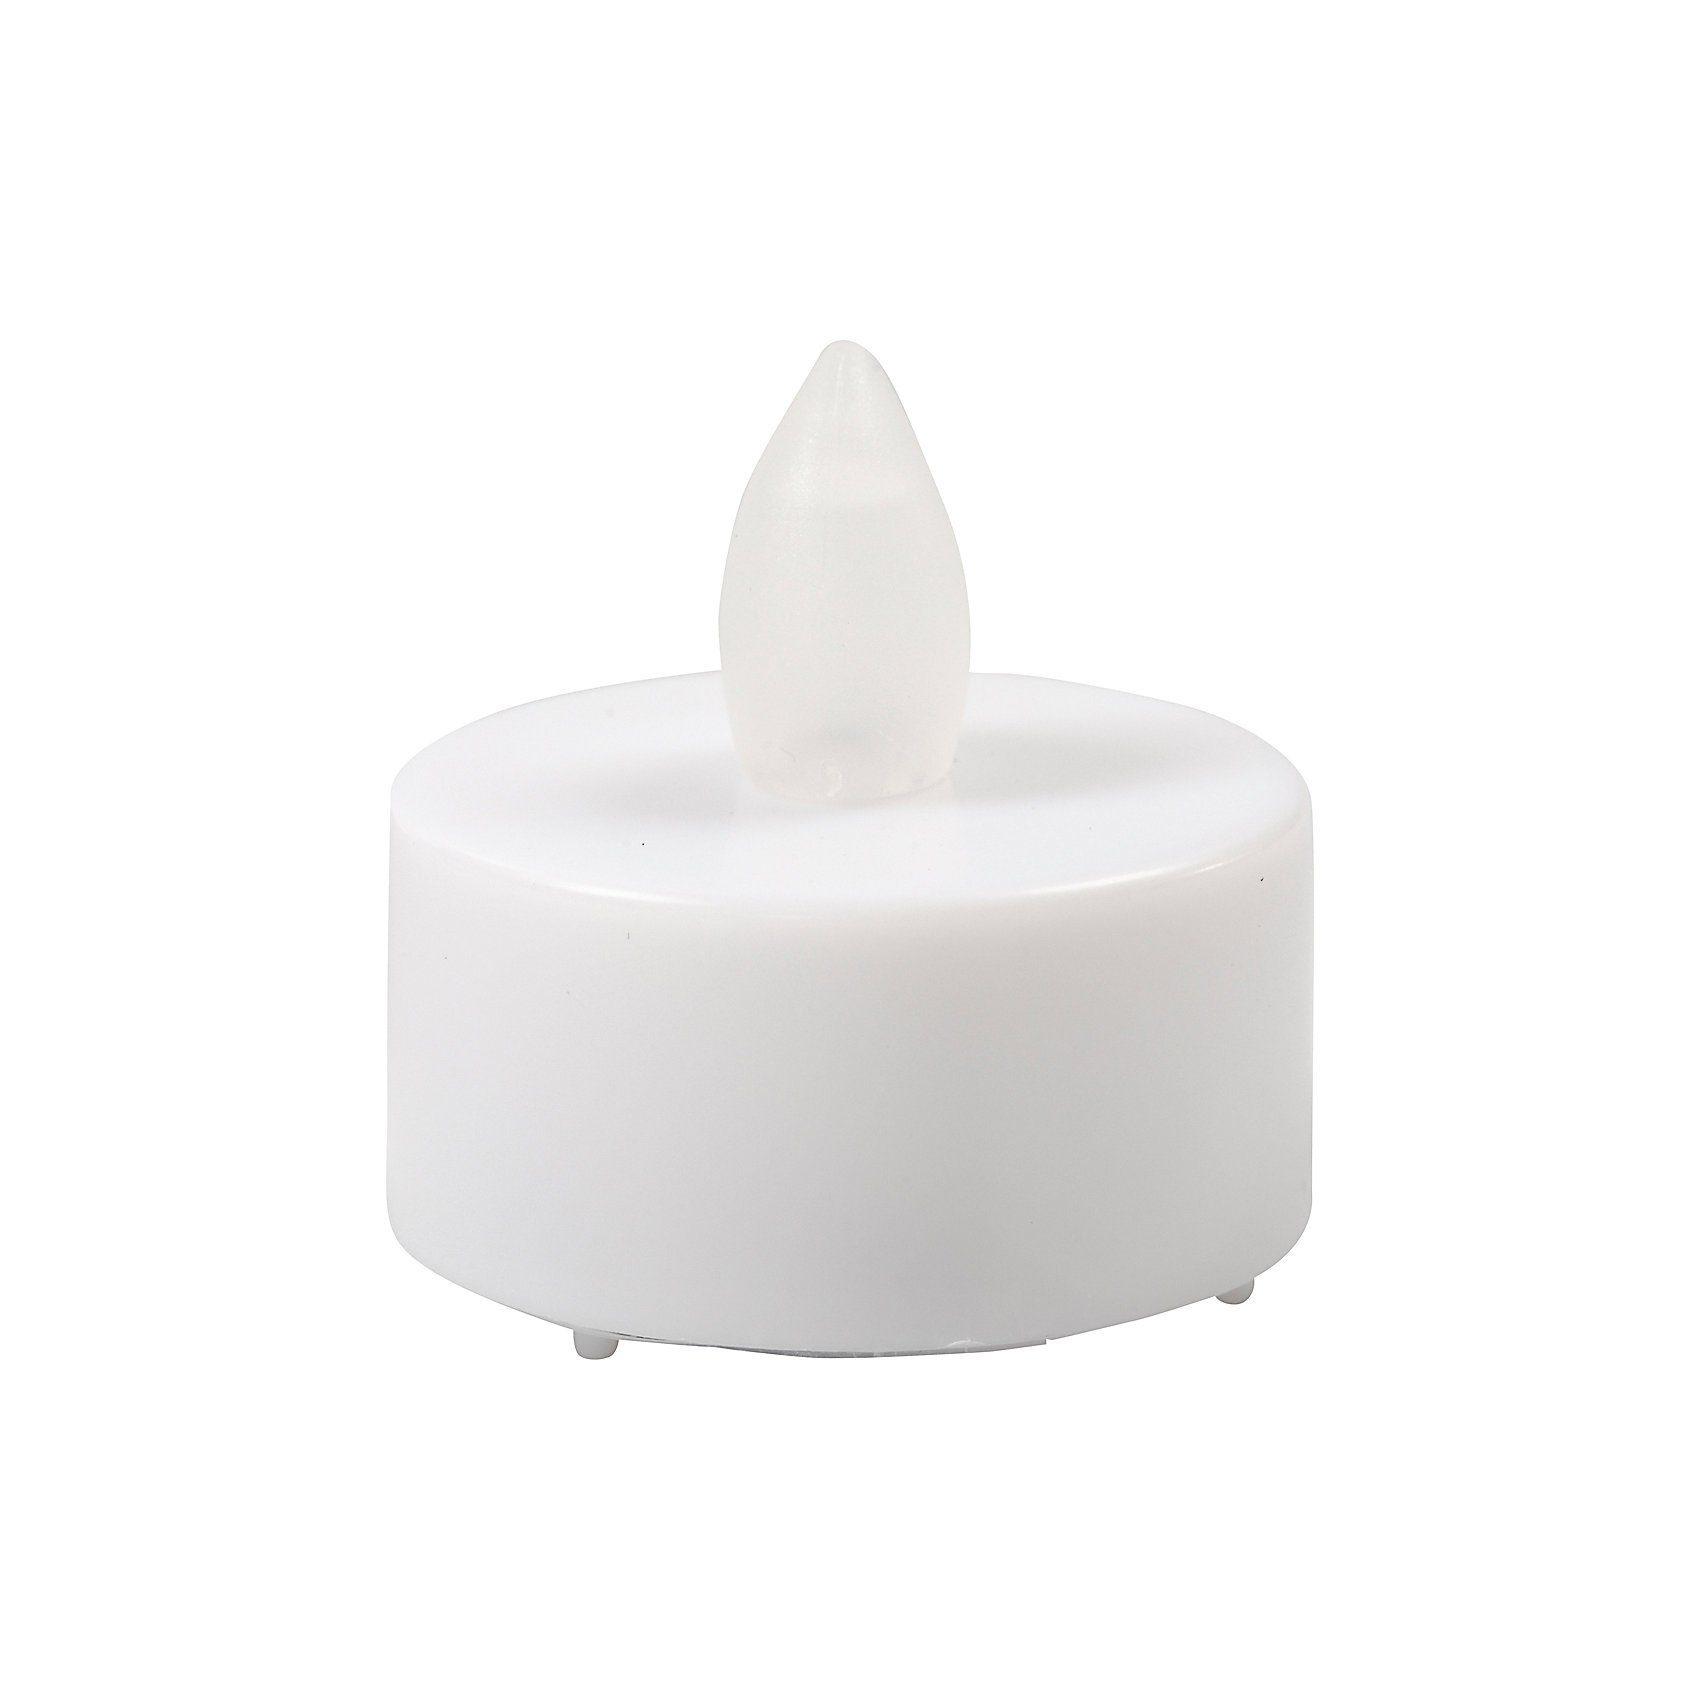 LED Teelicht-Kerze, H 35 mm, D: 38 mm, 24 Stck., Weiß